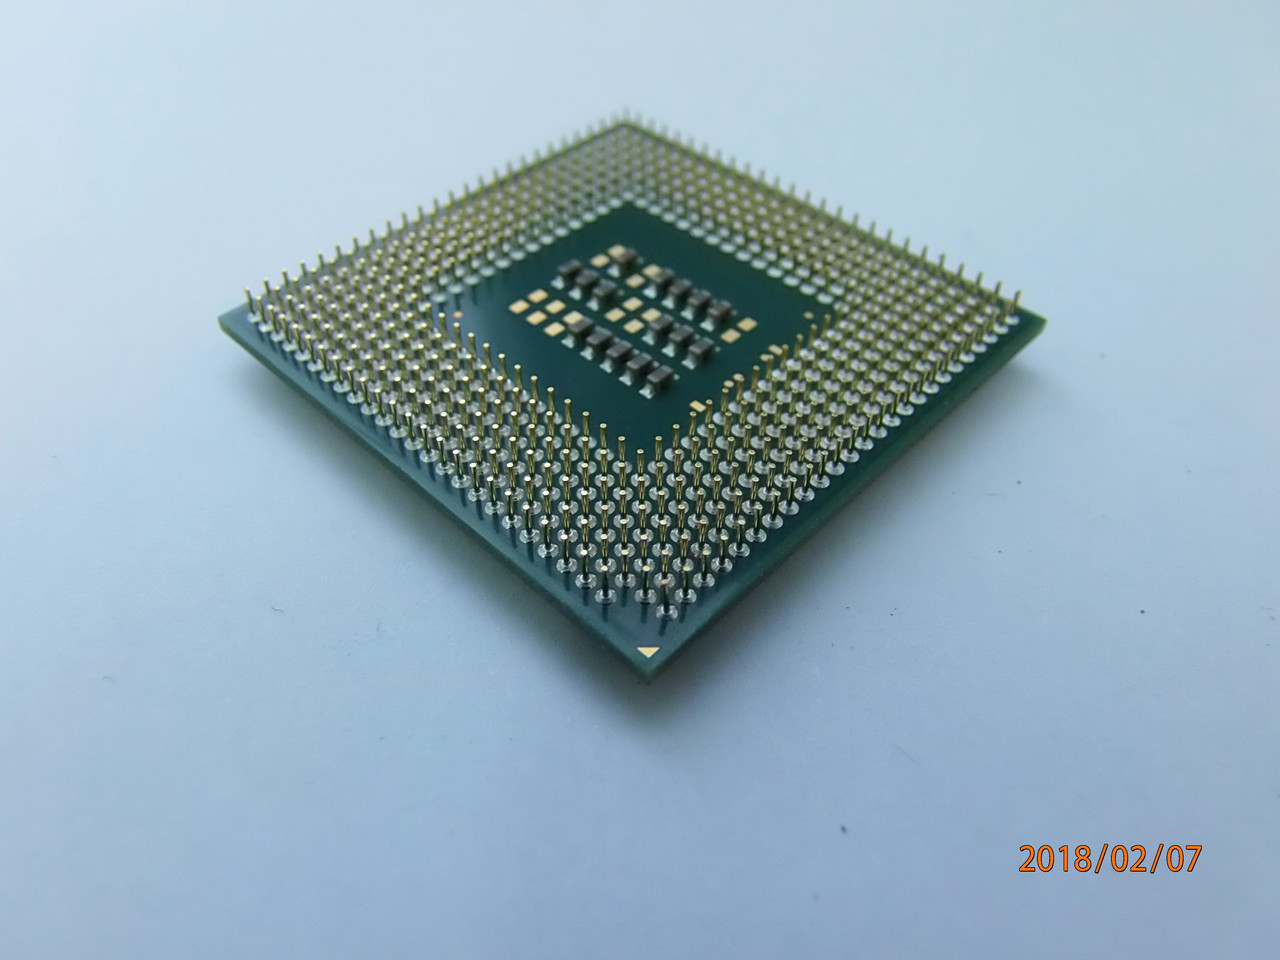 Процессор Intel Celeron  2,0Ghz/128/400/1.315V-1.525V SL6VY